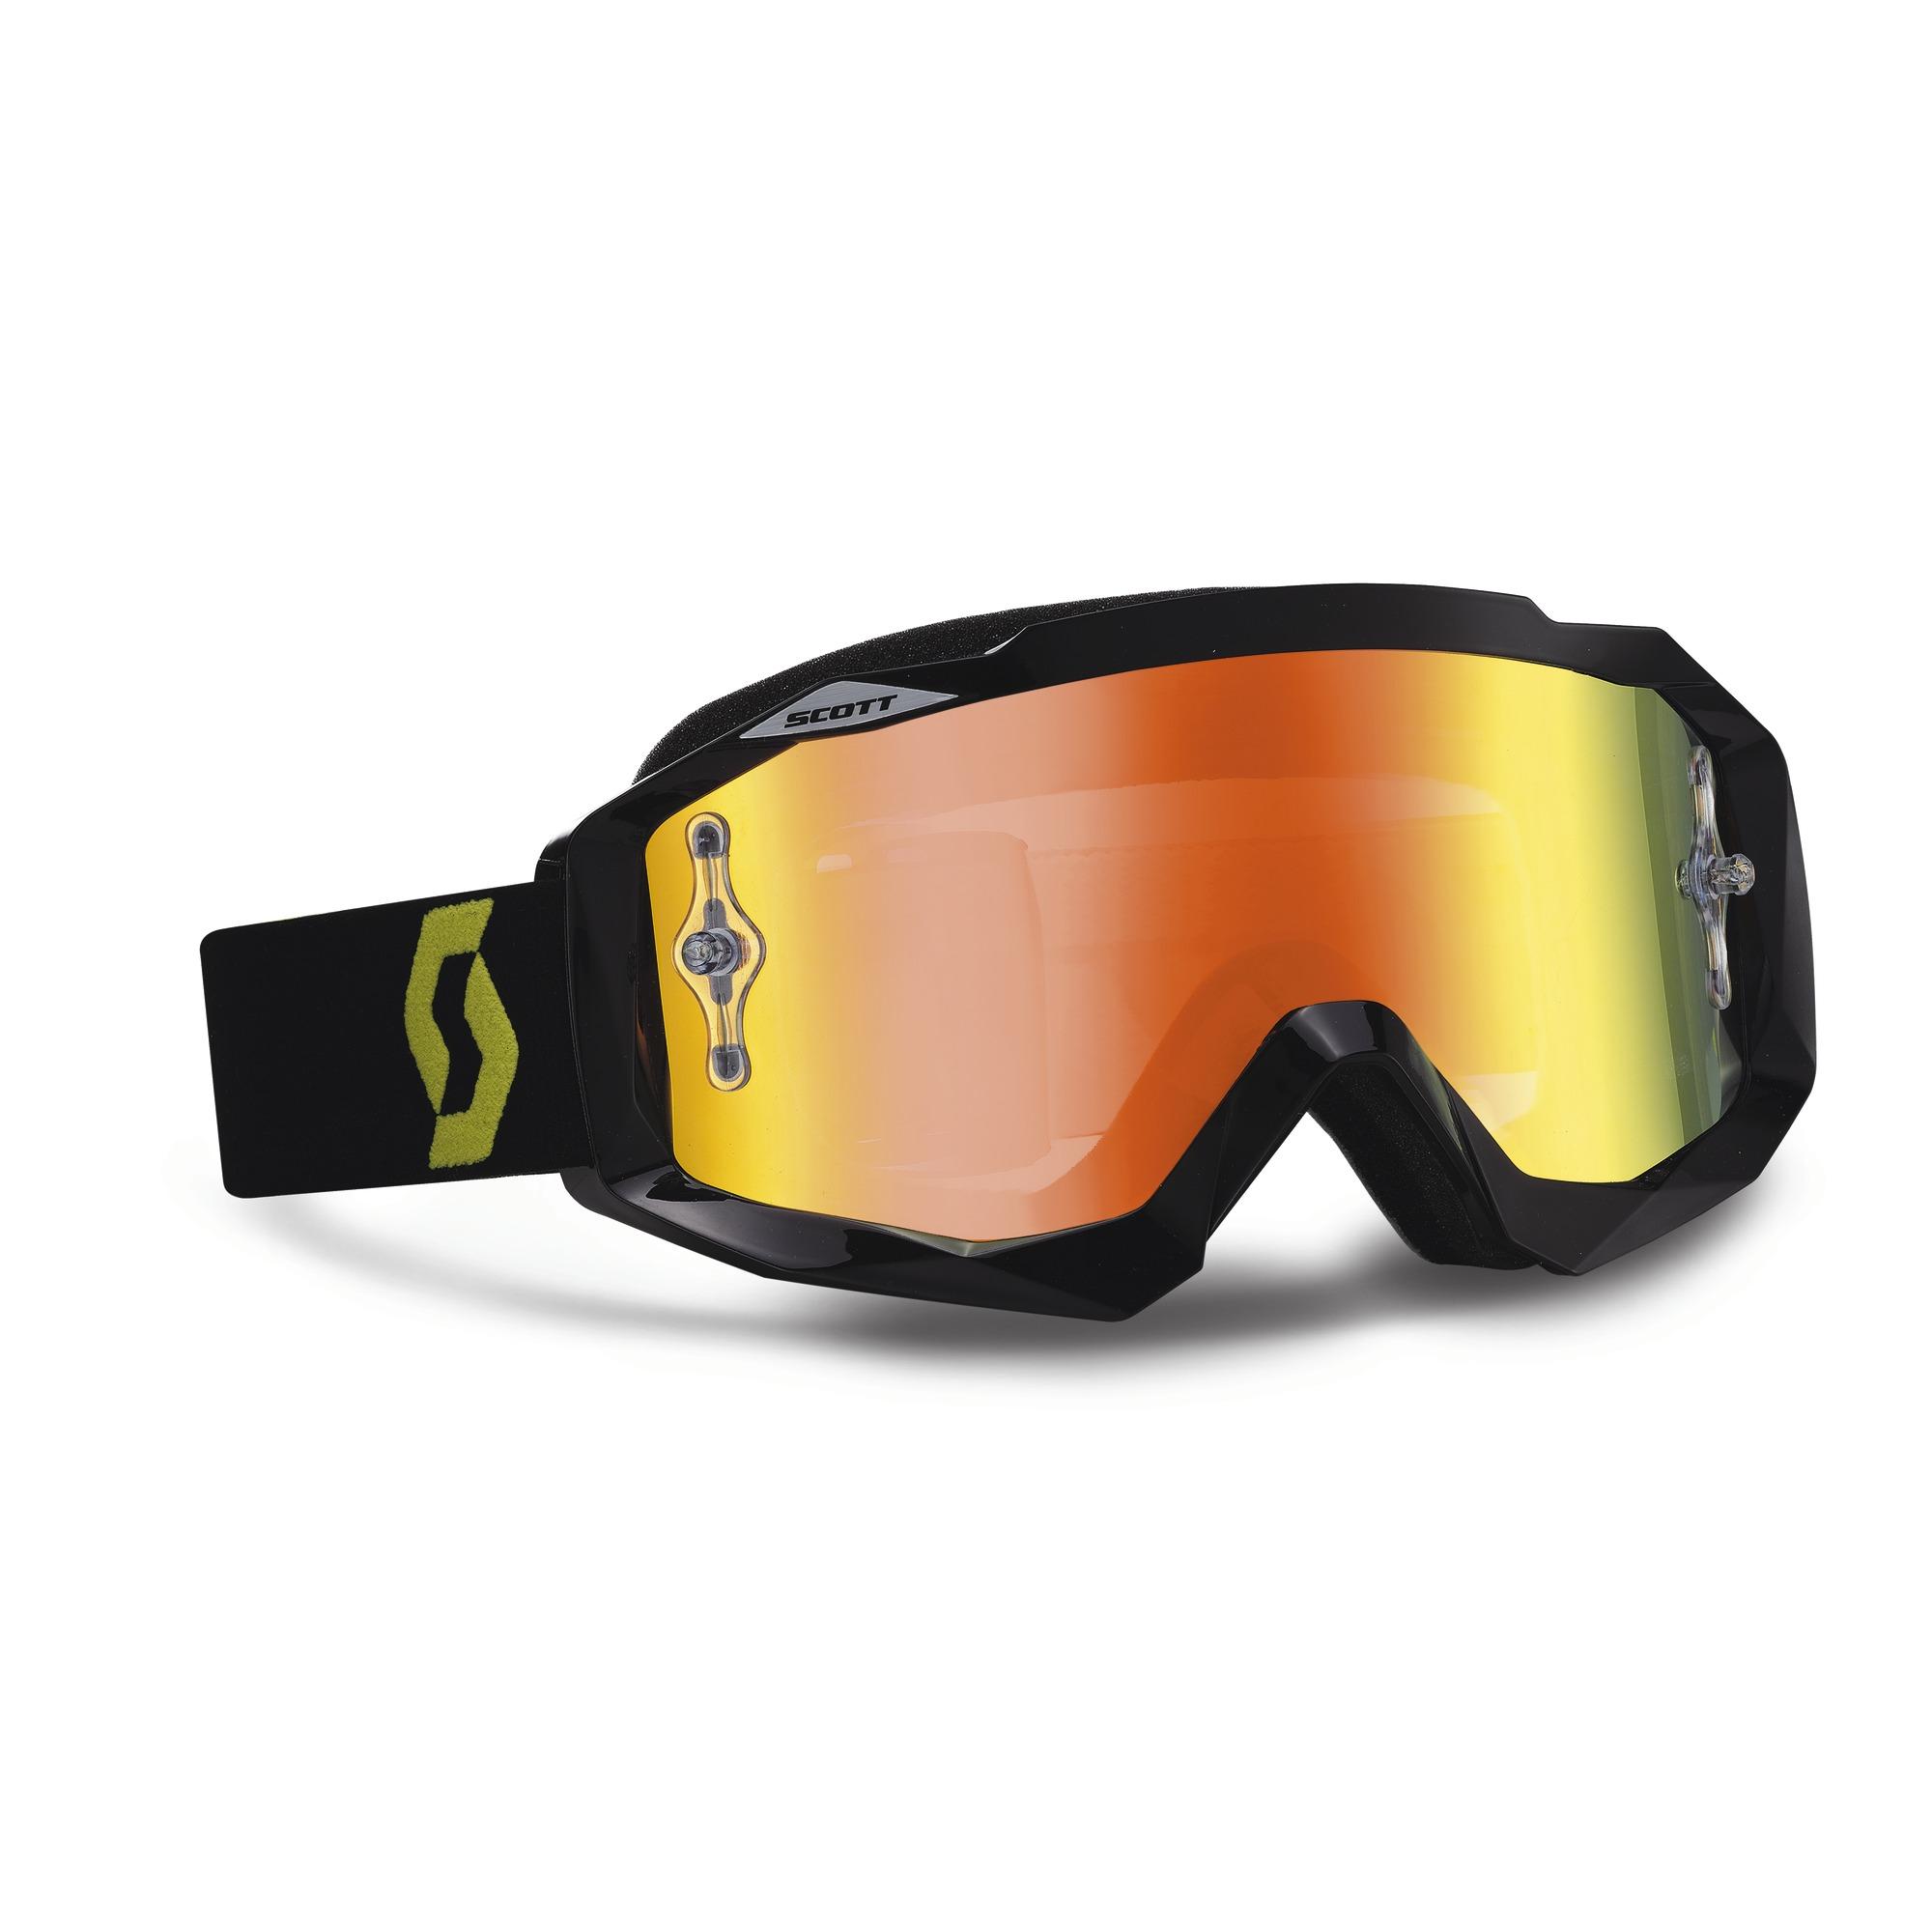 Scott Oxide Hustle MX cross goggles Black Green